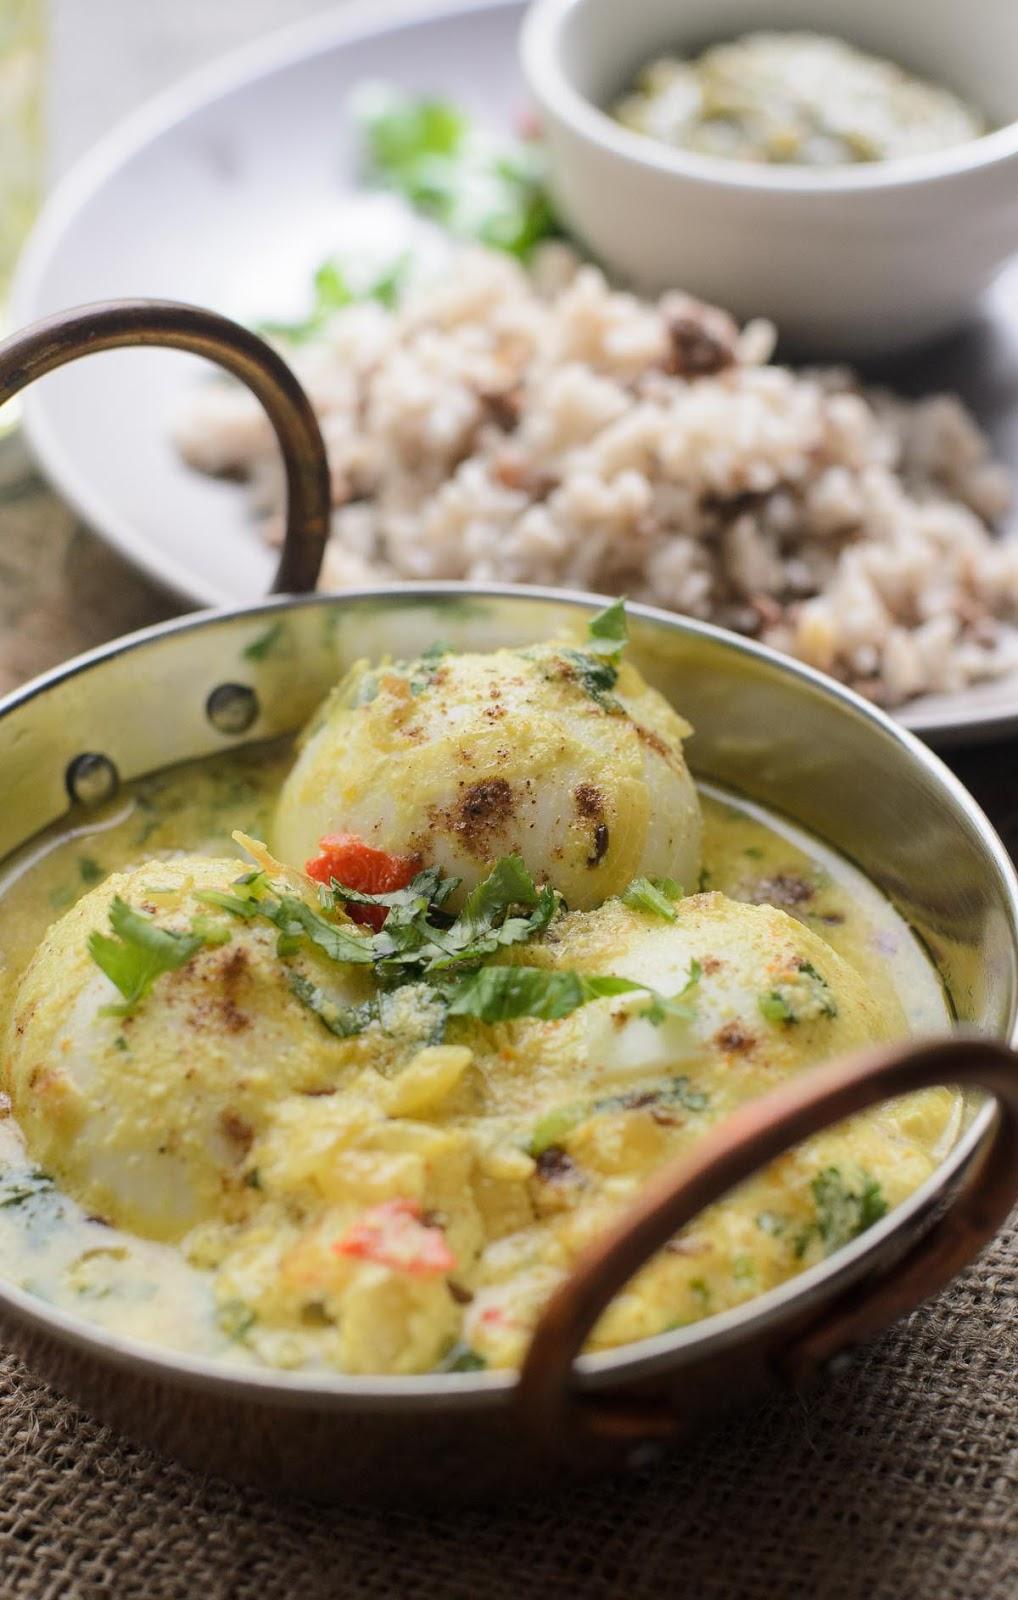 Vegetarian Eggs in Spiced Yogurt Sauce